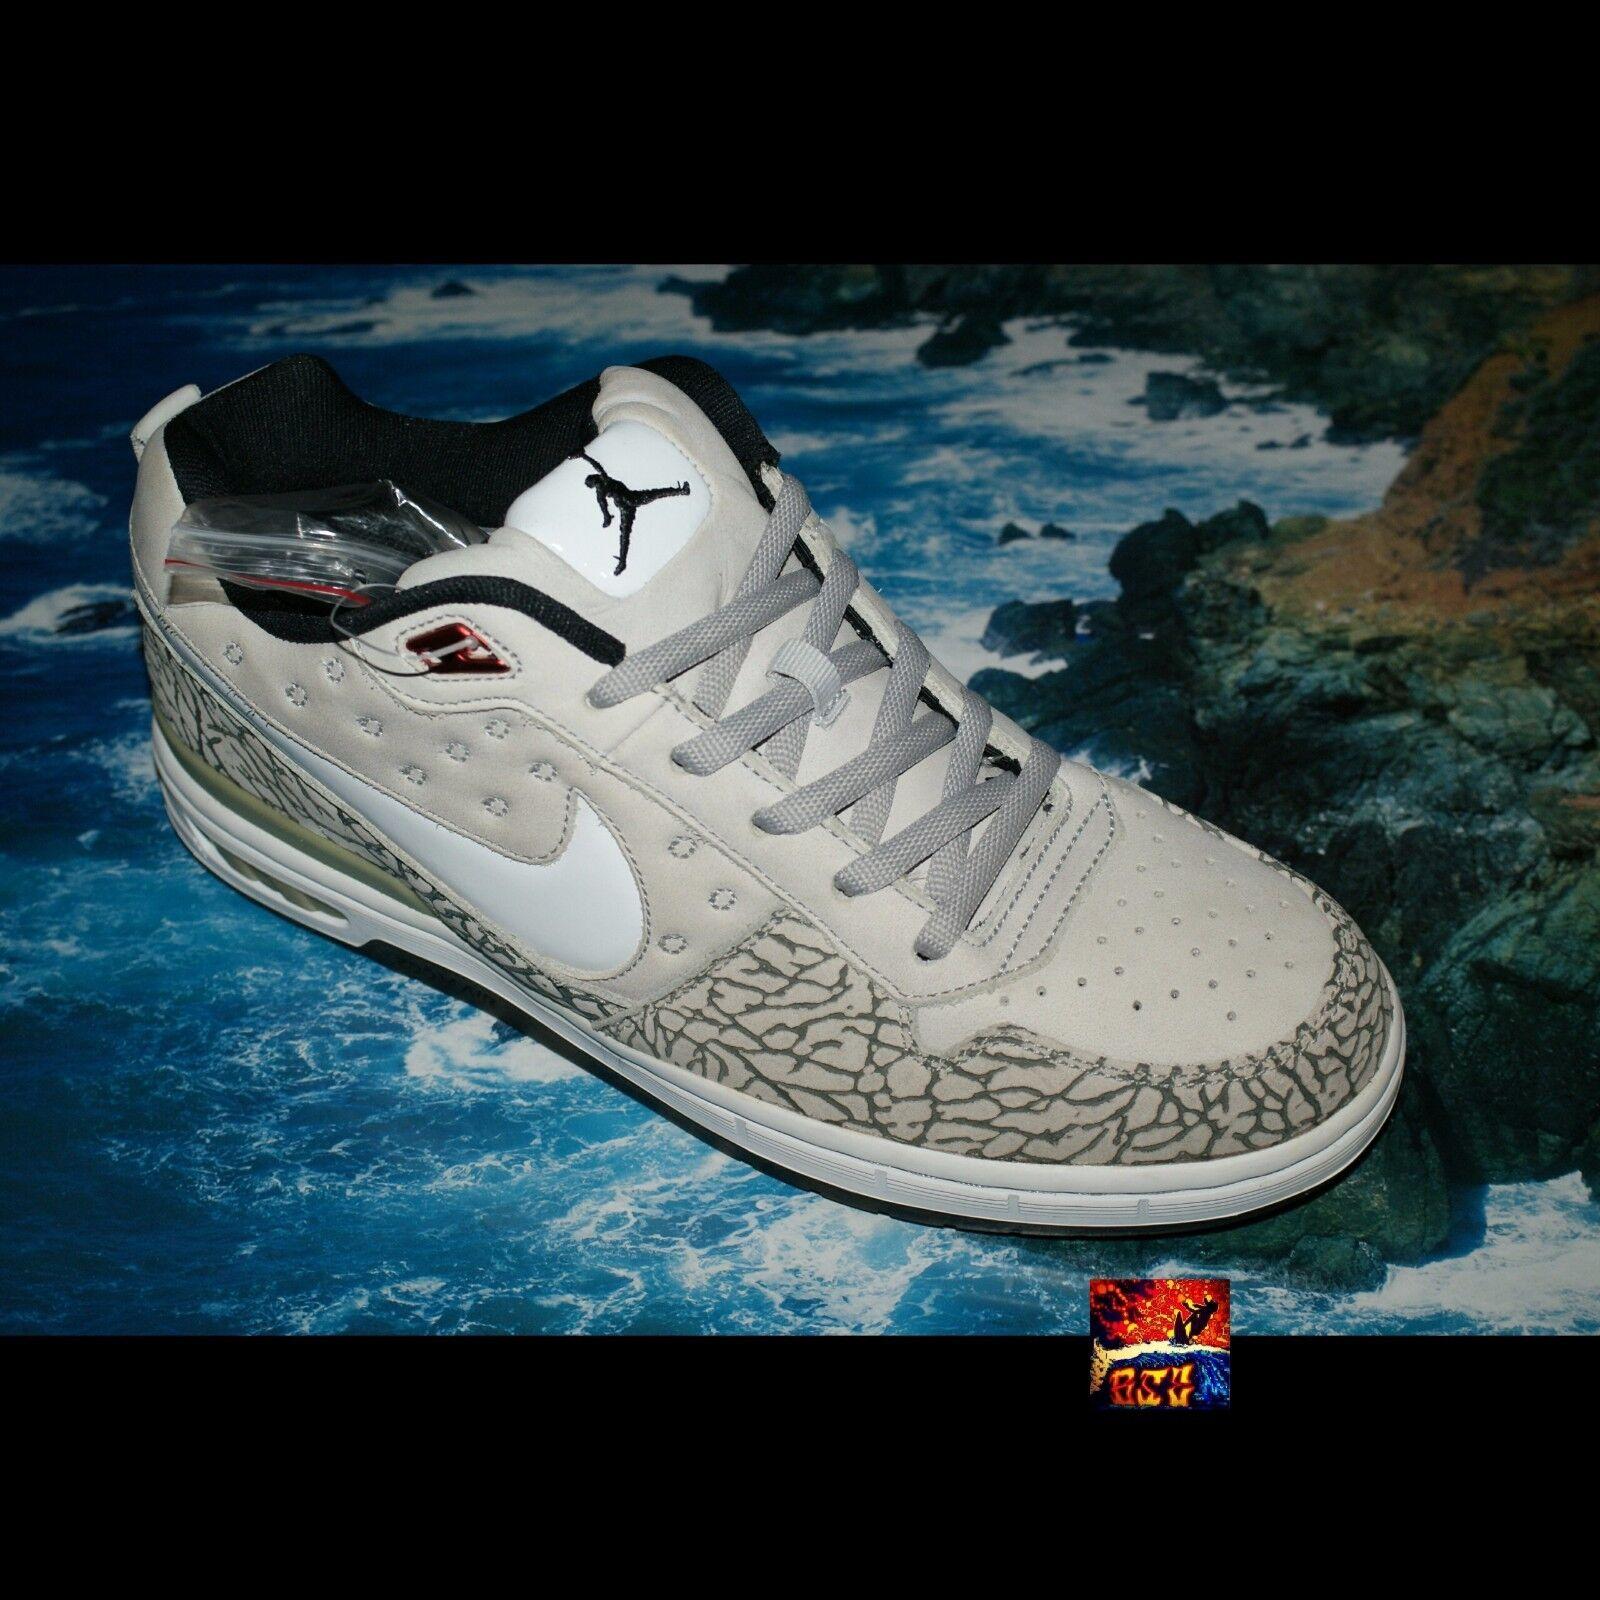 OG Nike SB Paul Rodriguez Zoom Air Elite  J-Rod  Sz 12 (Sz 11 Box) prod p-rod DS